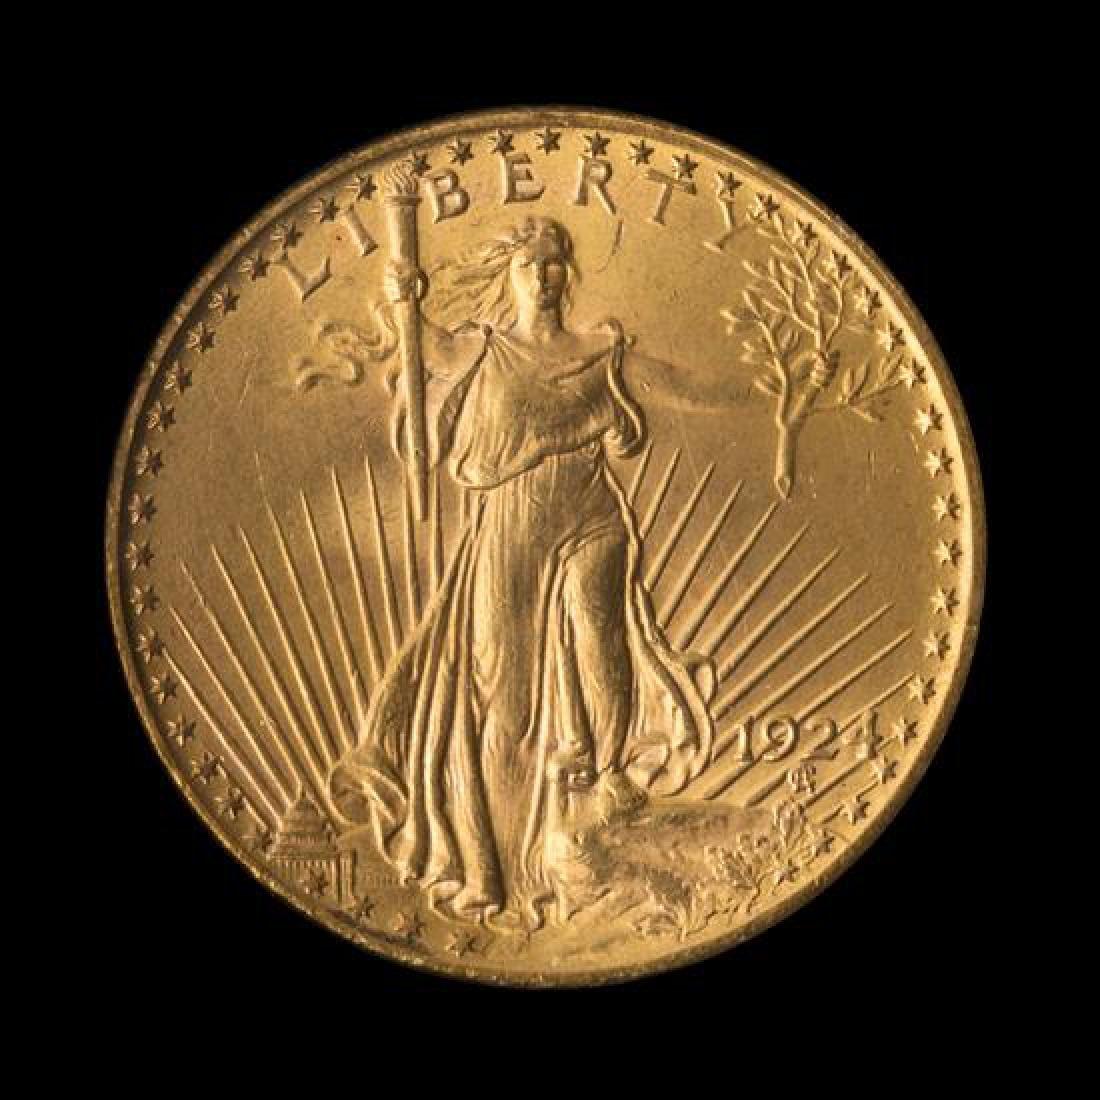 A United States 1924 Saint-Gaudens $20 Gold Coin